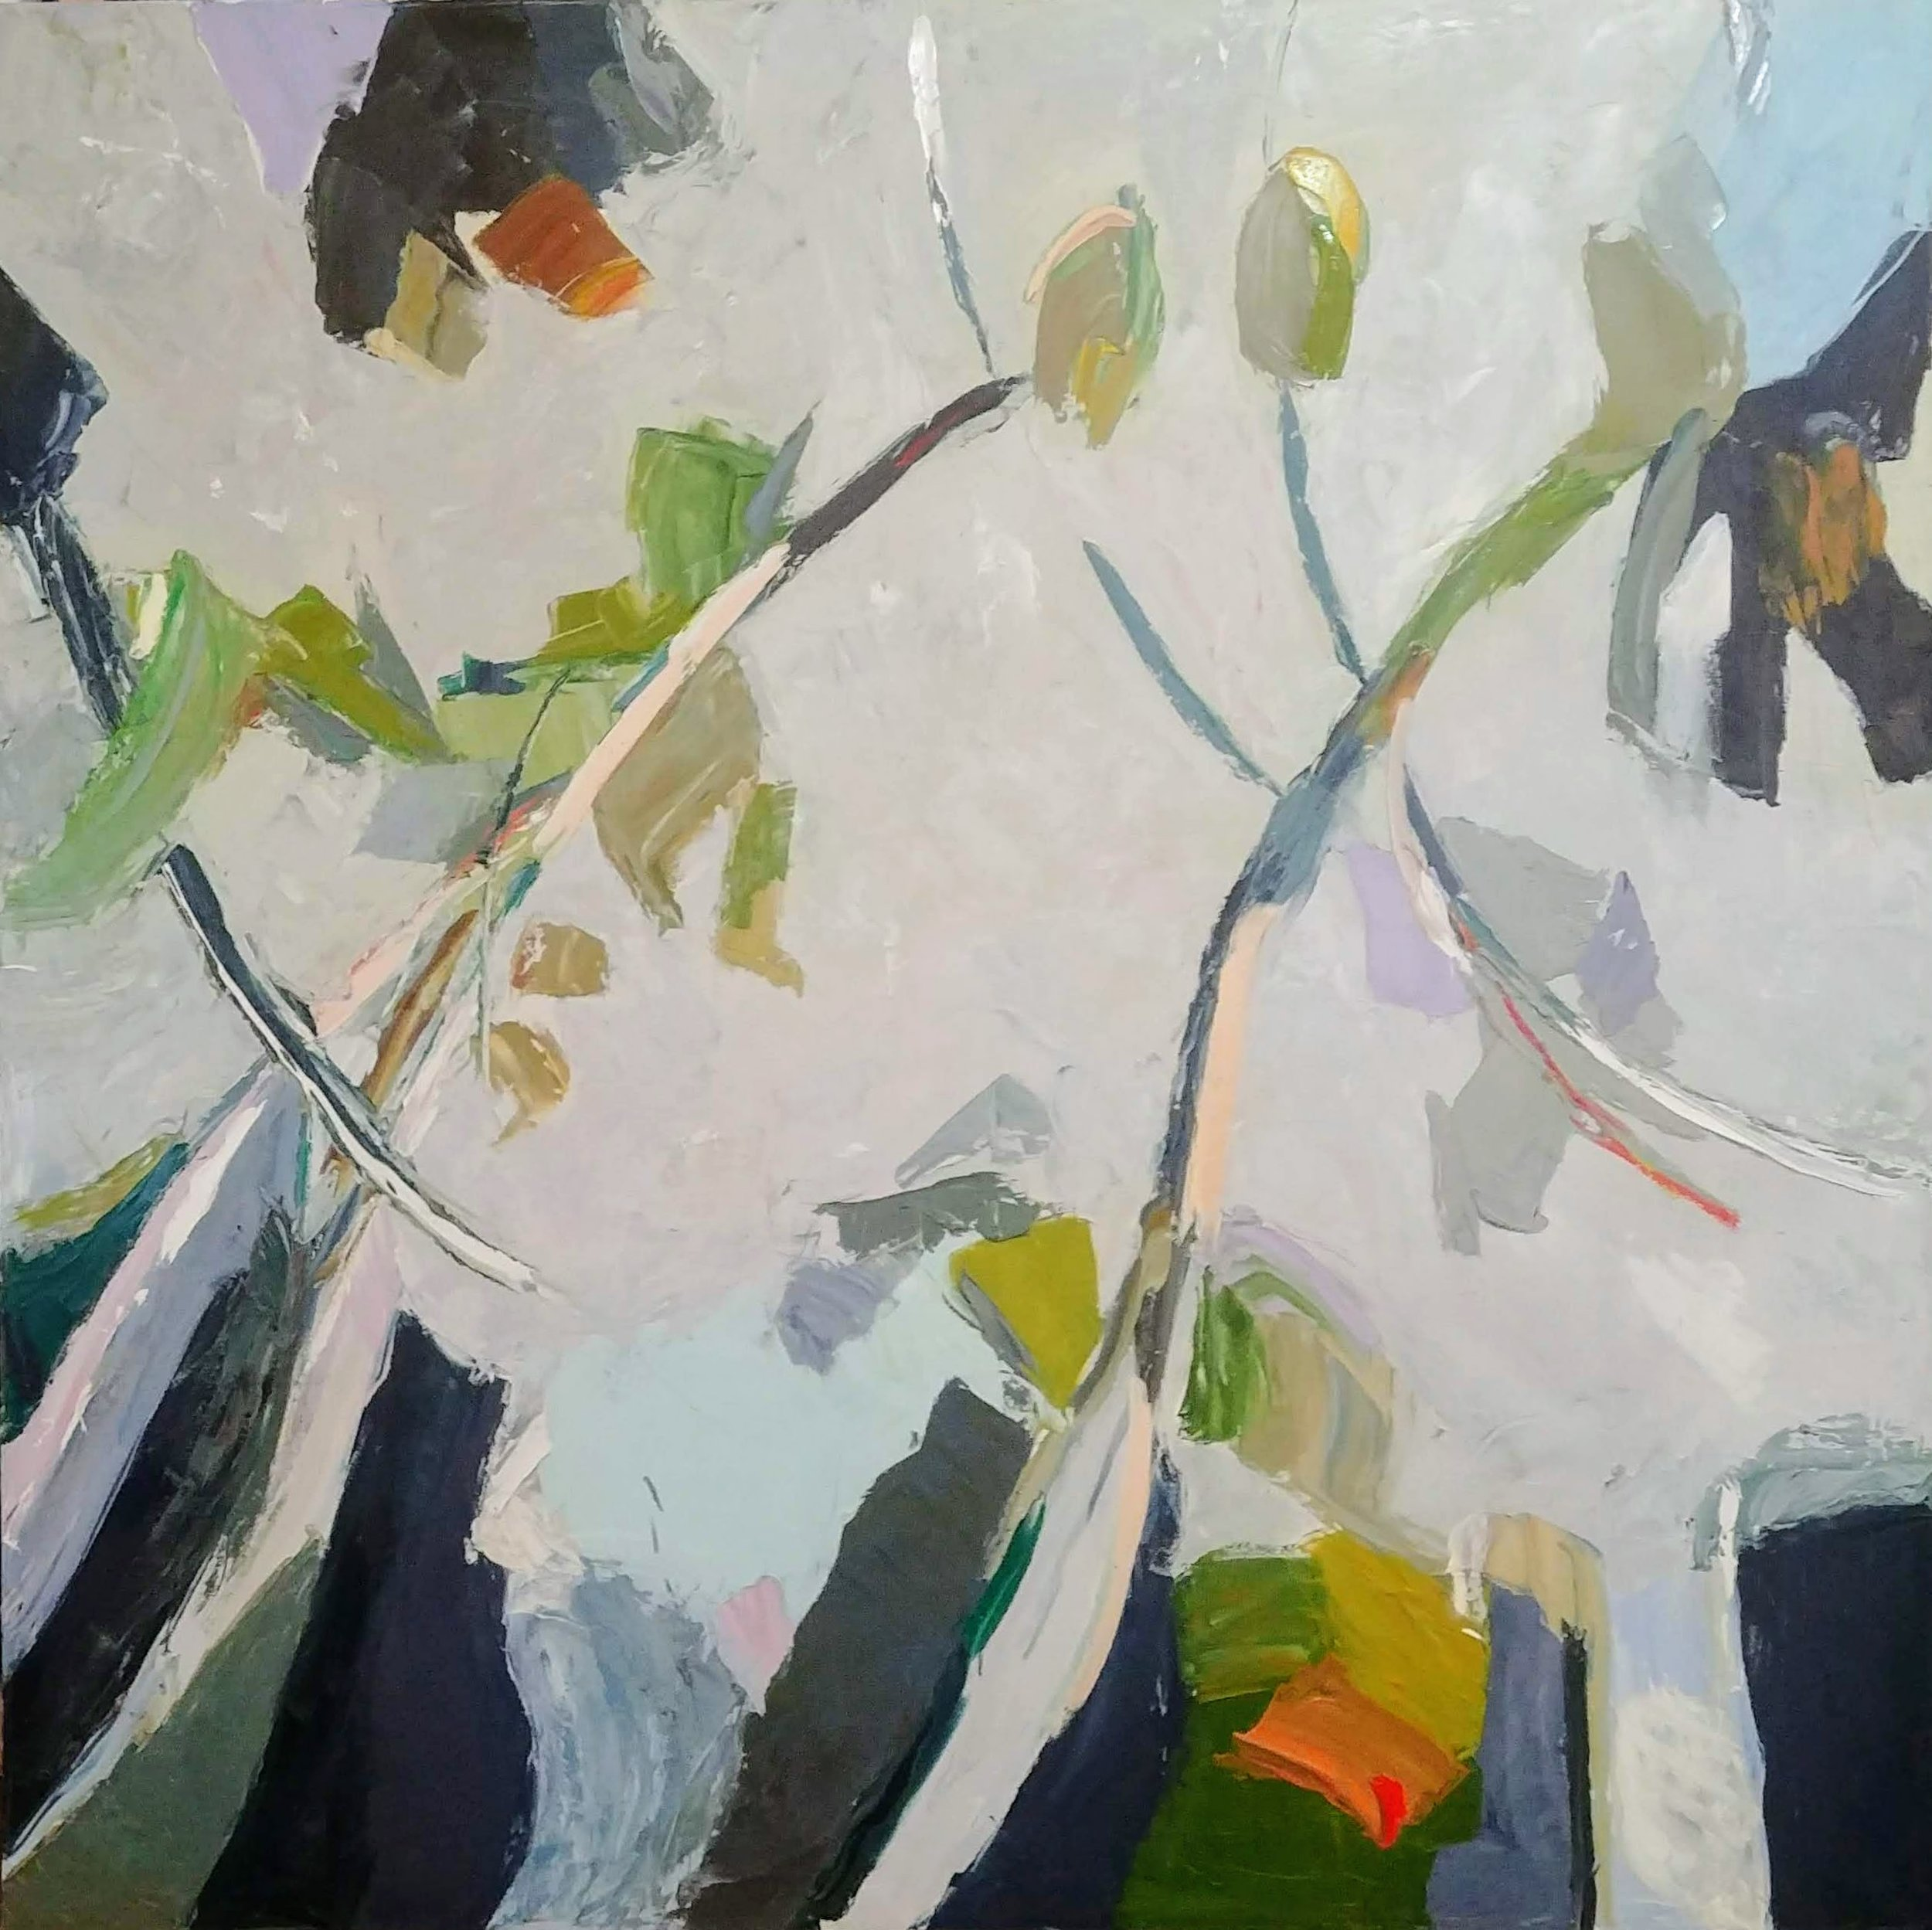 JulieDevine_BlueMoving_60x60_2019_oil on canvas_$5000.jpg